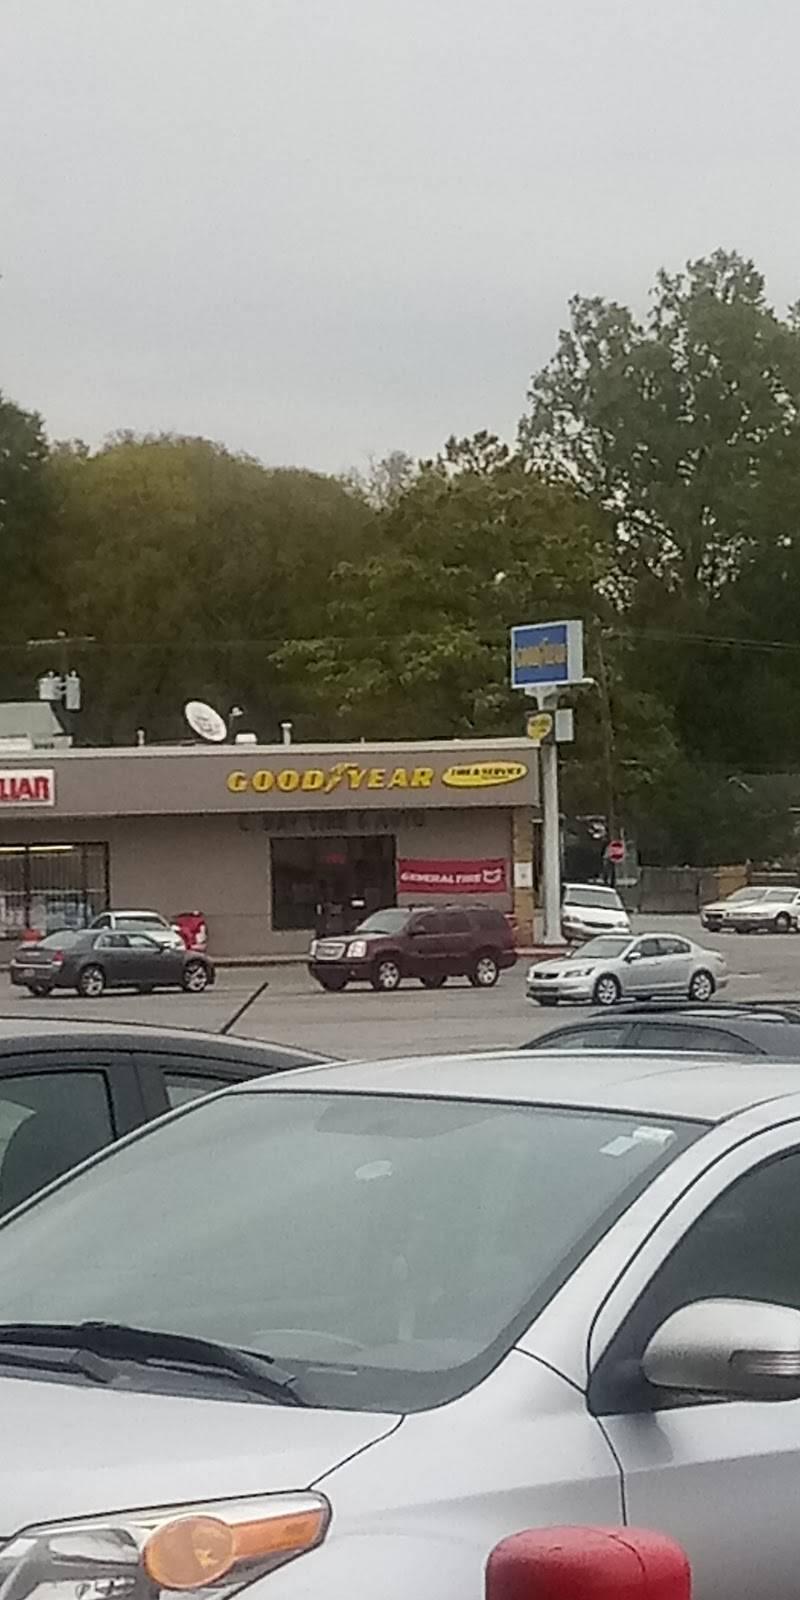 Good Year - car repair  | Photo 1 of 1 | Address: Vandergrift Rd, Midfield, AL 35228, USA | Phone: (205) 923-4747